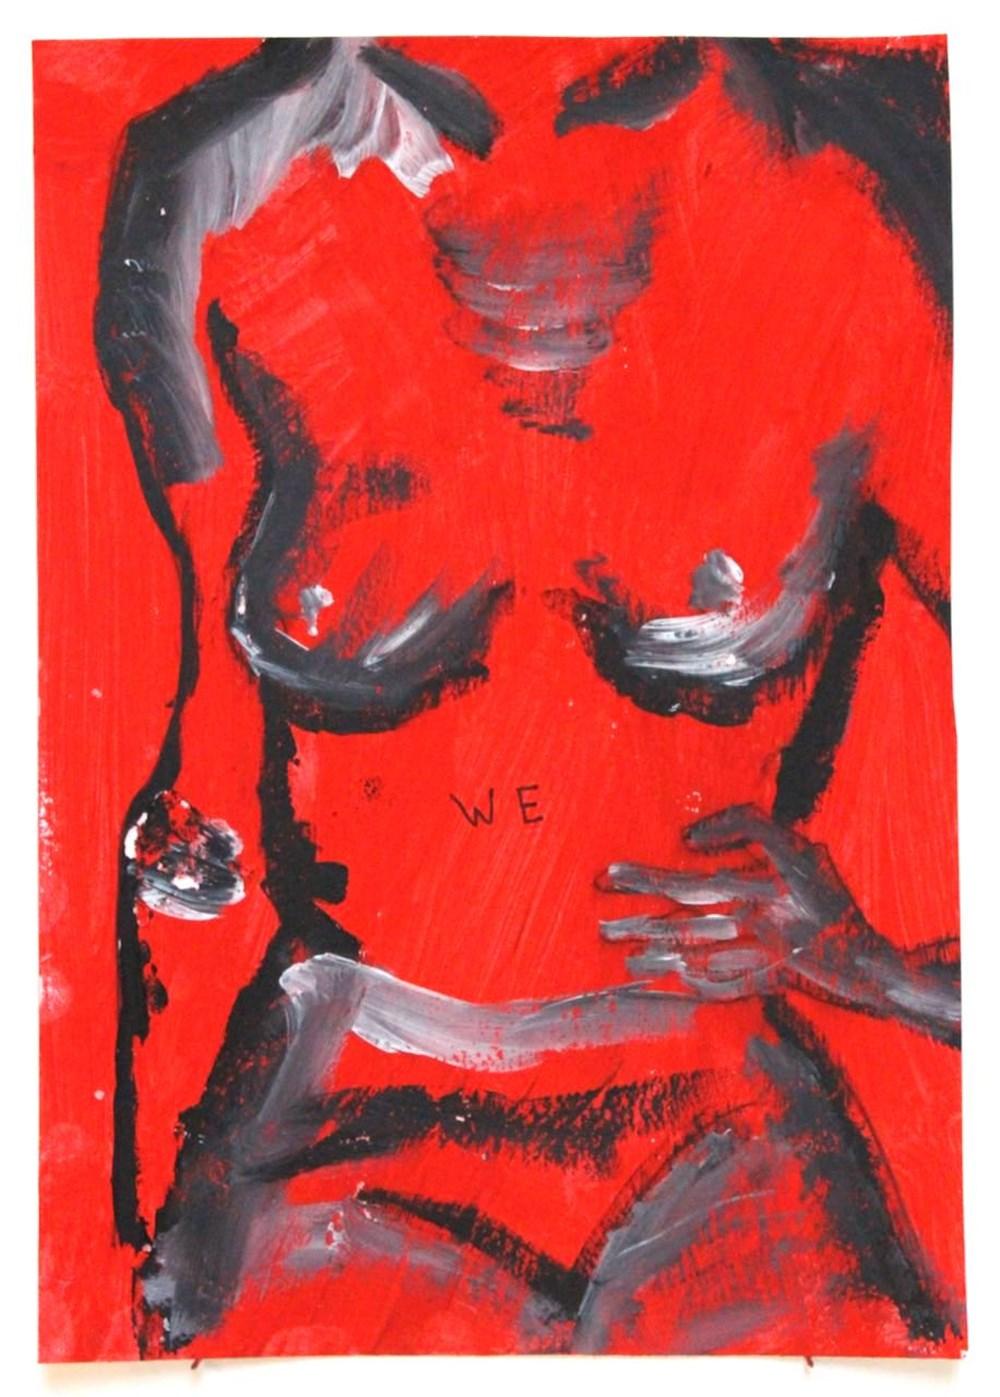 Life on Venus II | The Human, Timed Auction - Lot 24, Lina Sokolovaite, We